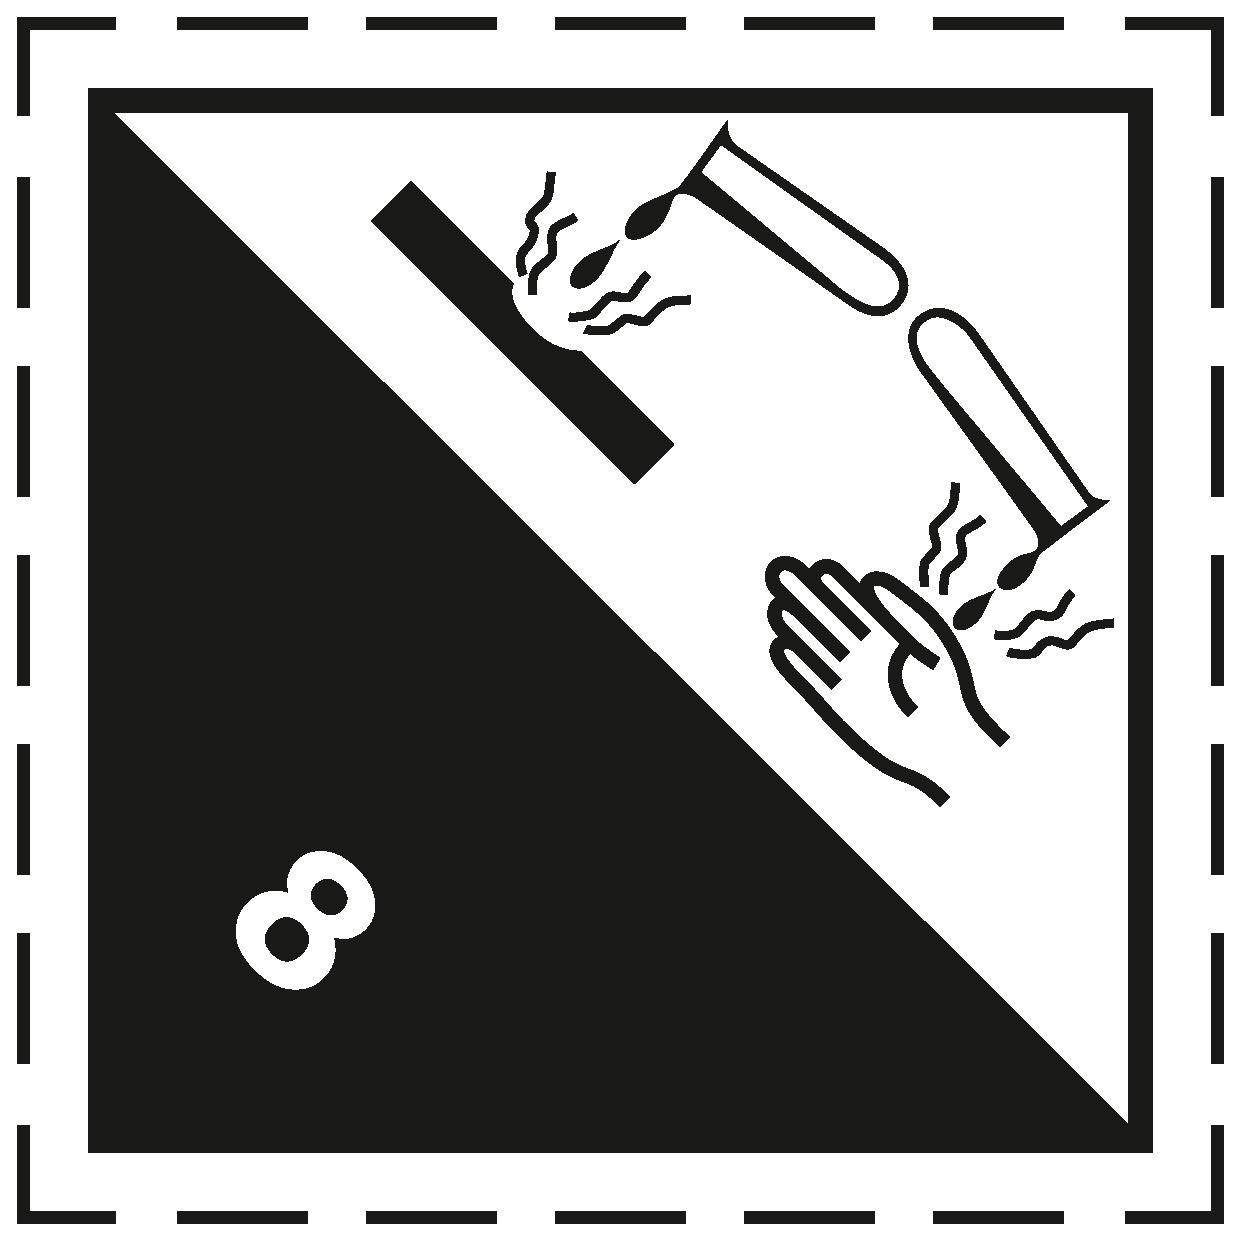 ADR 8